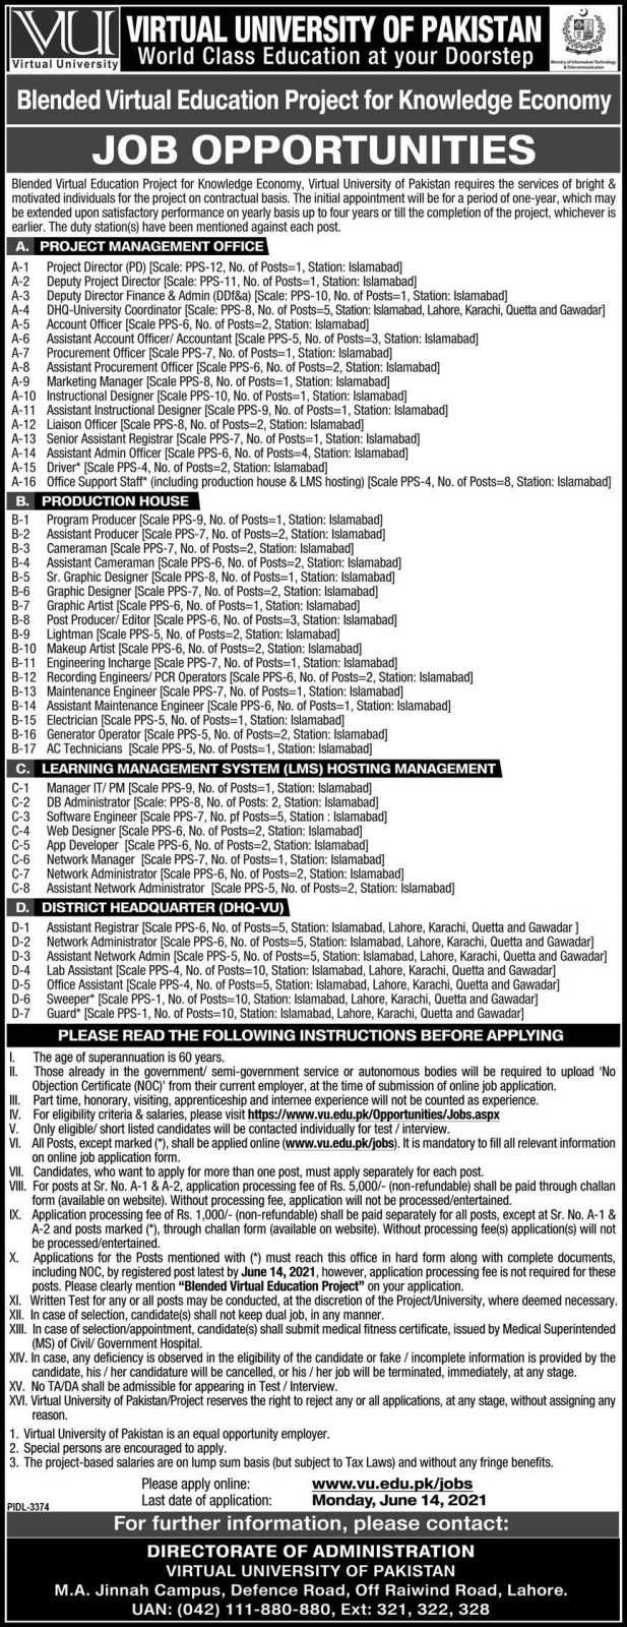 Virtual University of Pakistan Jobs 2021